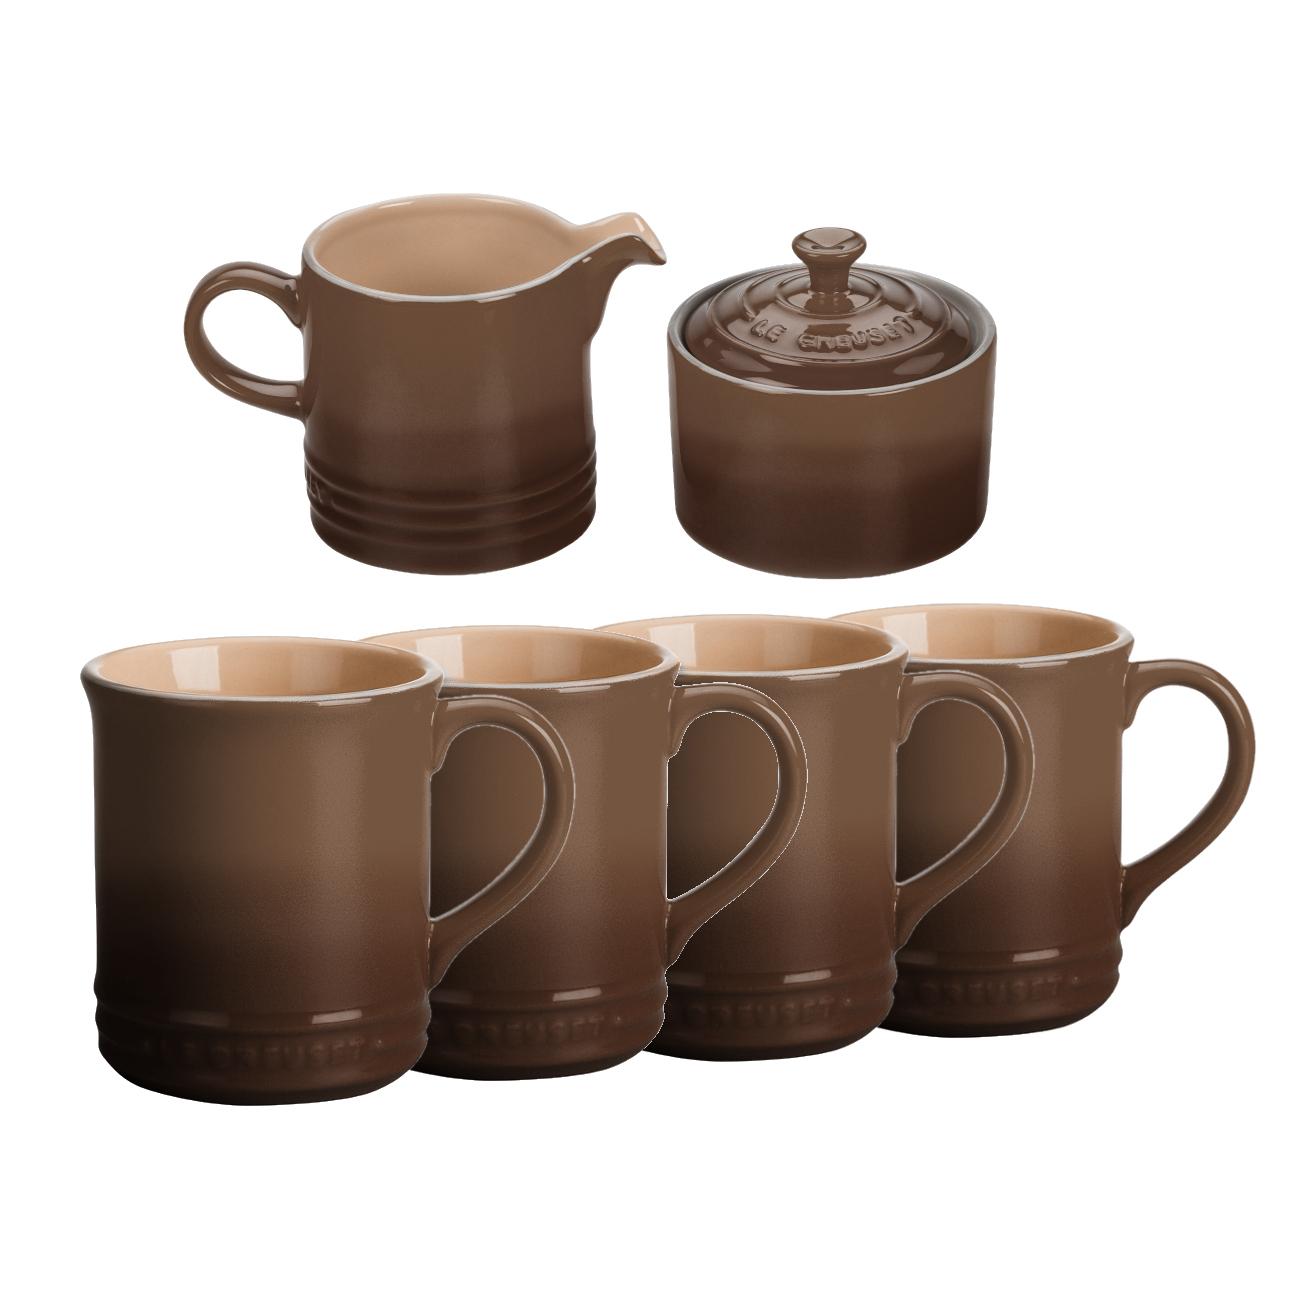 Le Creuset Truffle Stoneware 6 Piece Coffee or Tea Service Set with Mugs and Cream & Sugar Set